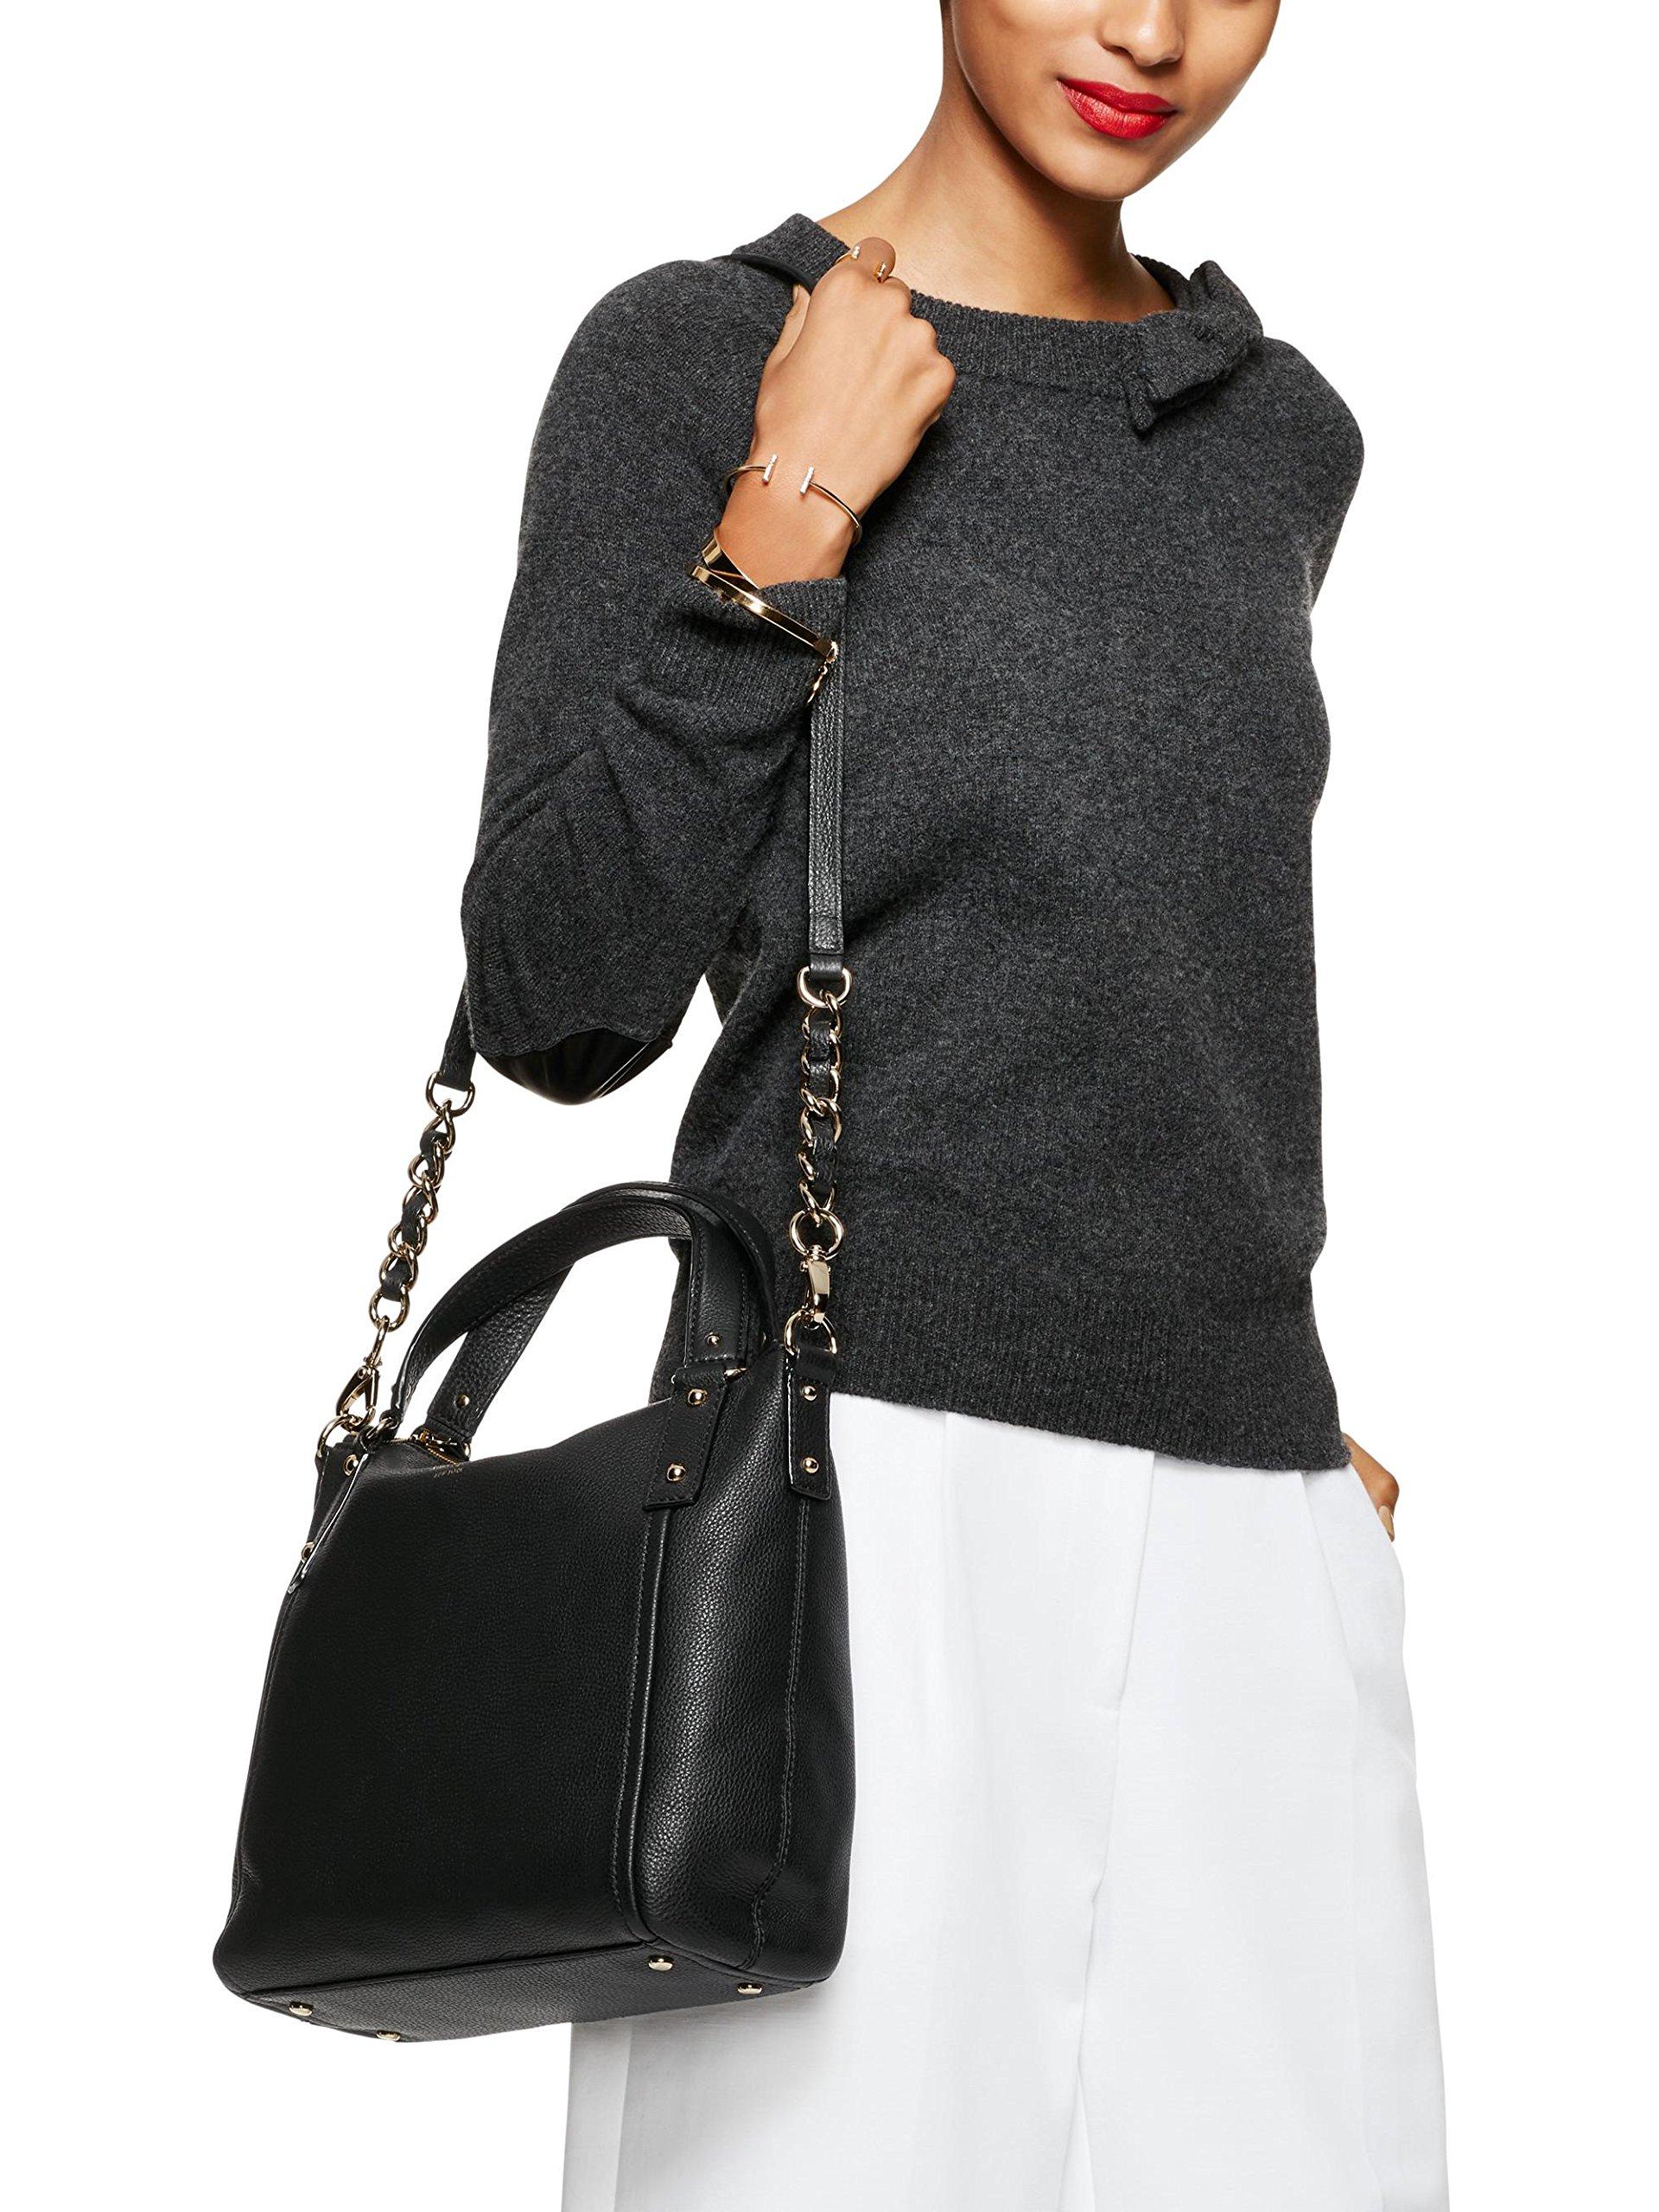 Kate-Spade-New-York-Pine-Street-Small-Kori-Black-Leather-Shoulder-Bag